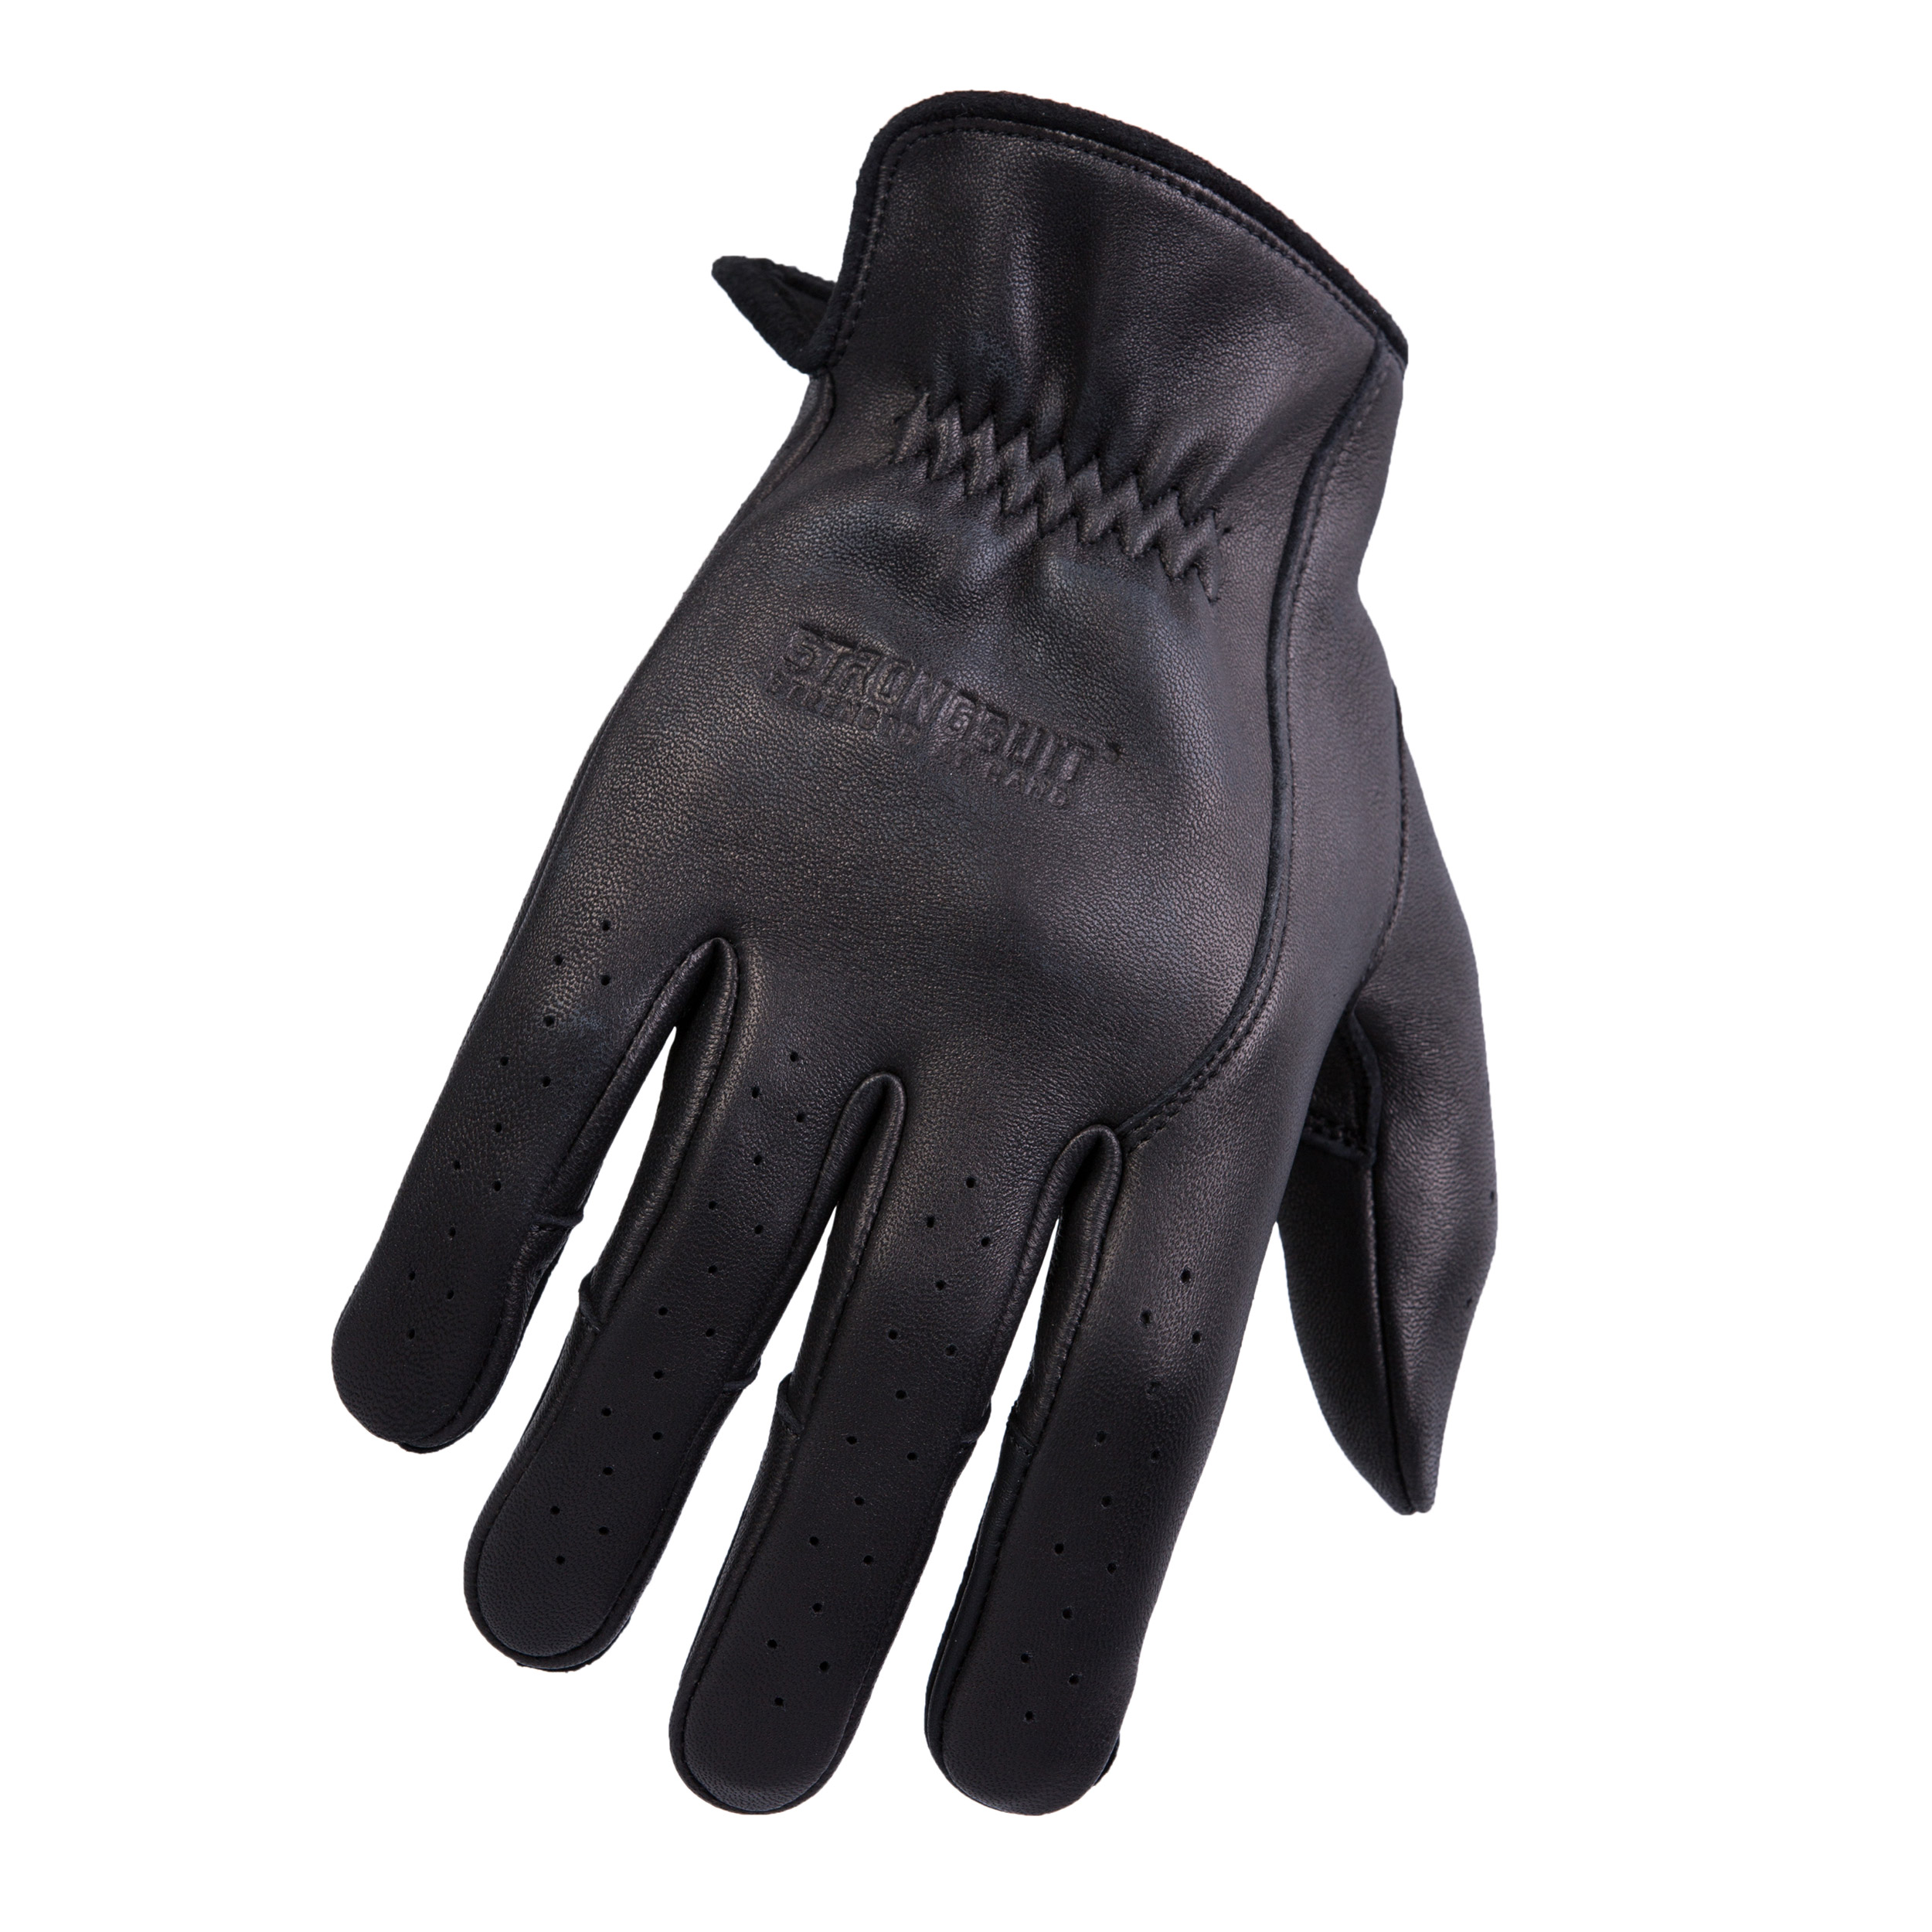 Essence Gloves, Black, XXL